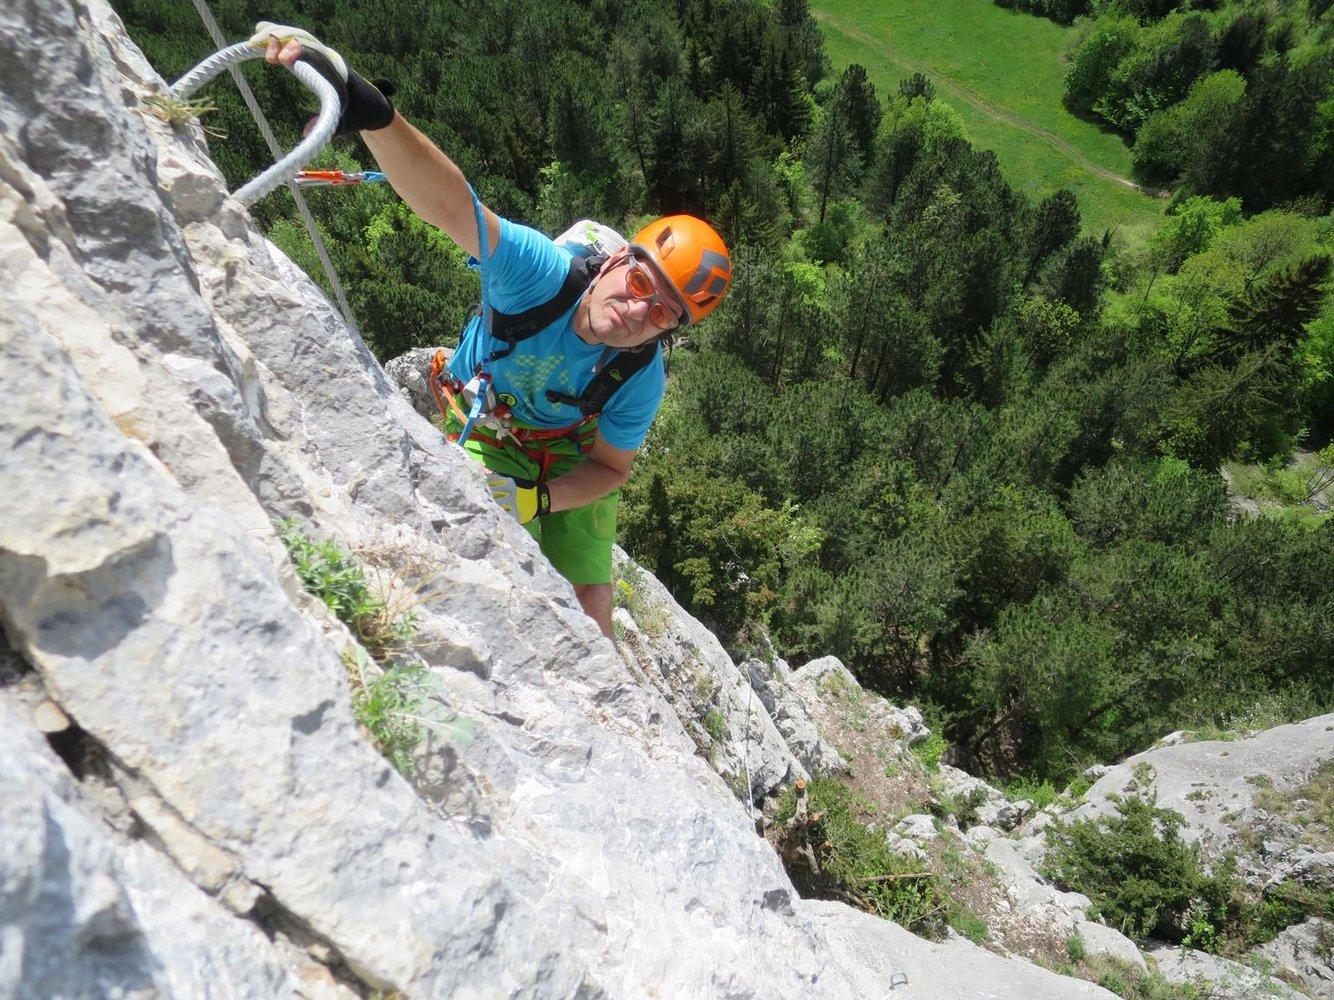 Klettersteigset Verleih Wien : Ötk klettersteig hohe wand bergsteigen.com